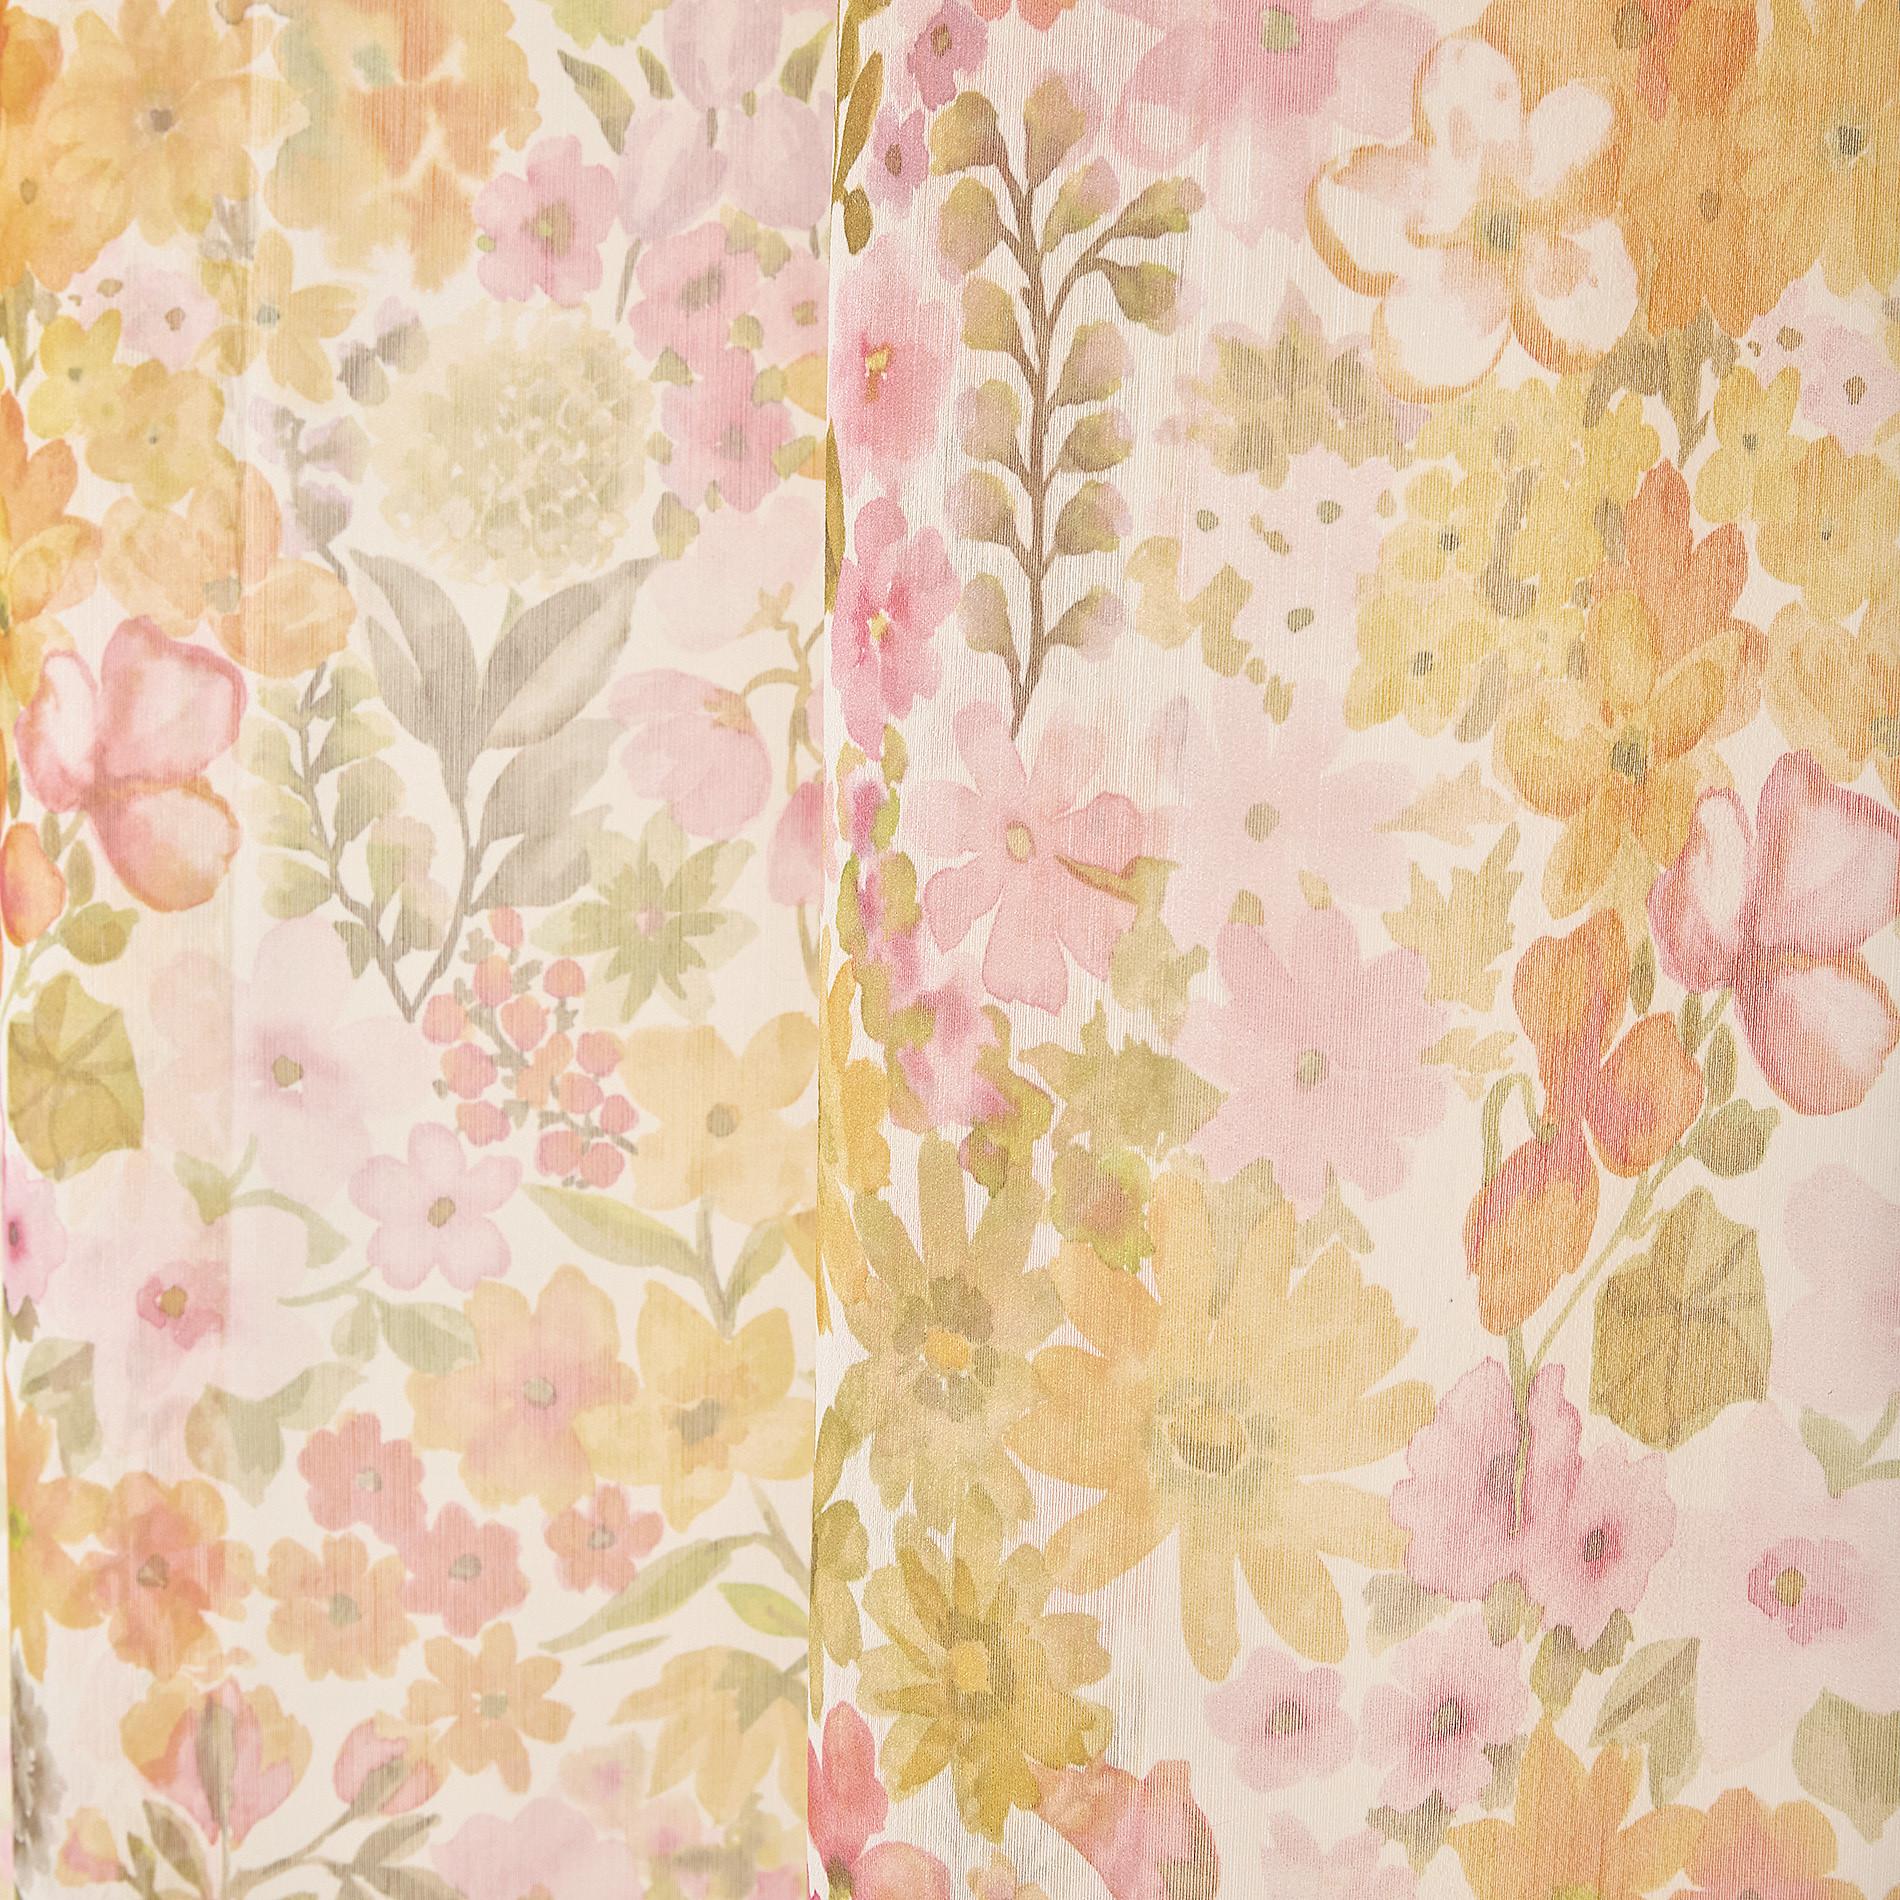 Tenda stampa floreale passanti nascosti, Multicolor, large image number 3